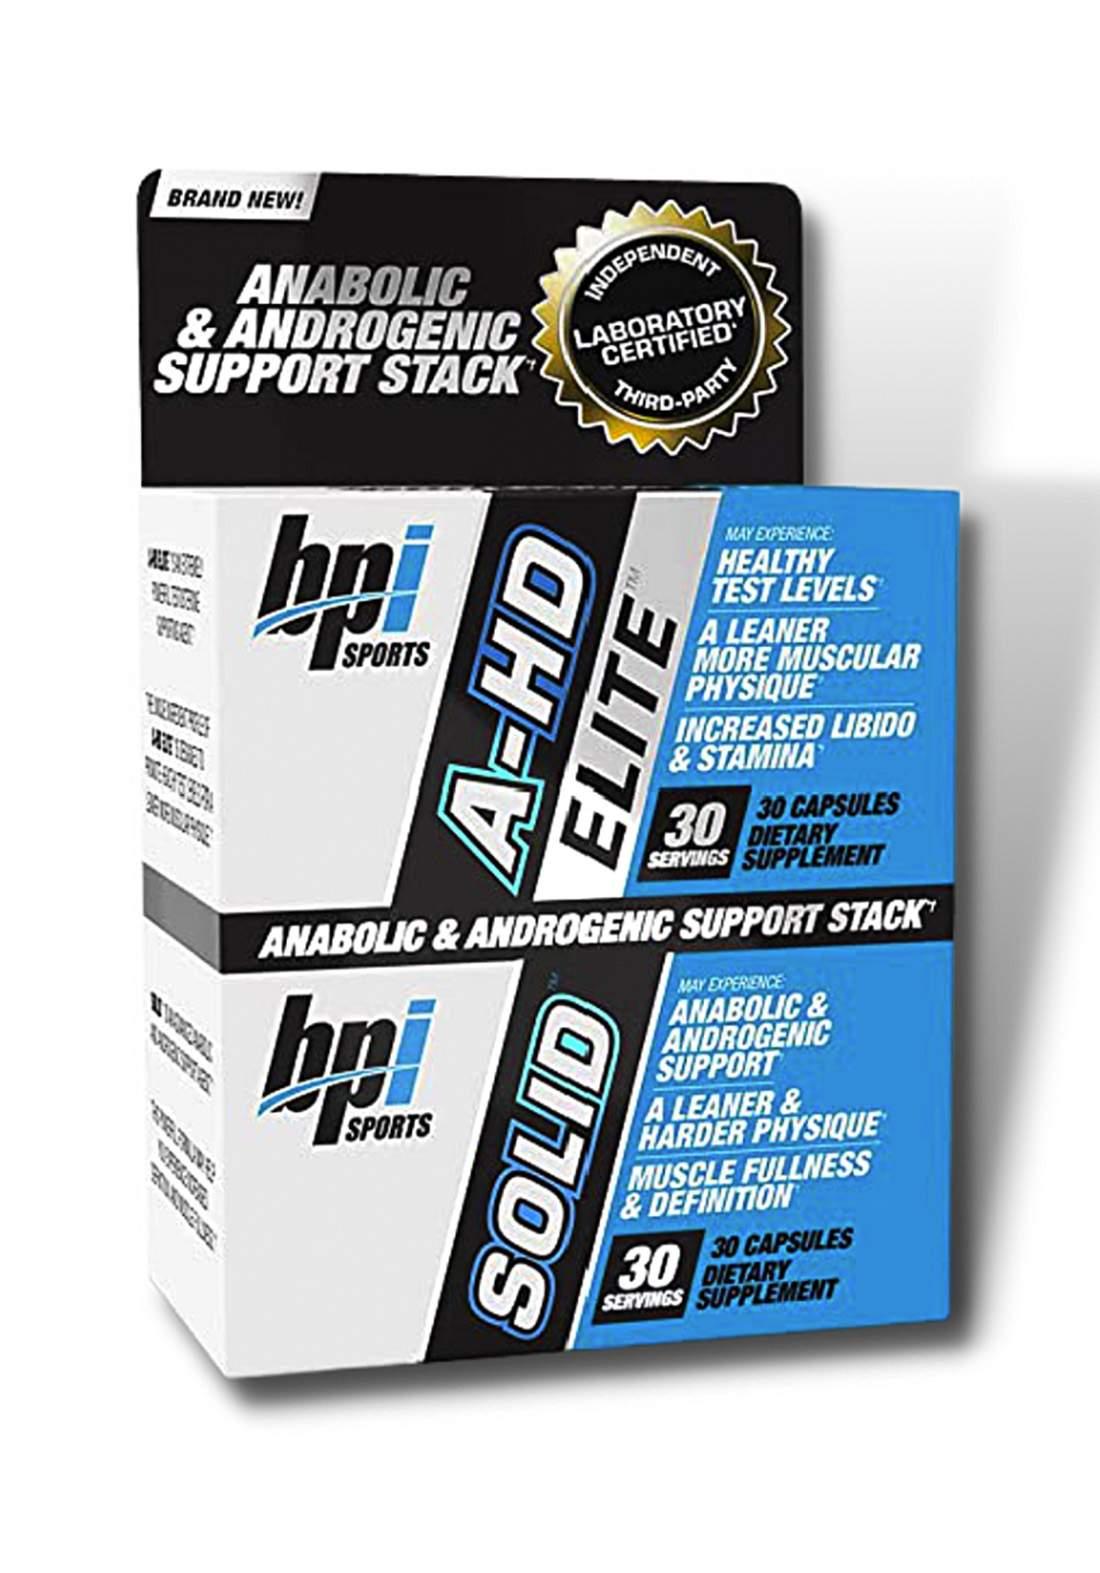 Bpi Sports A-Hd Elite/Solid Combo (30 Capsules) مكمل الأداء الرياضي